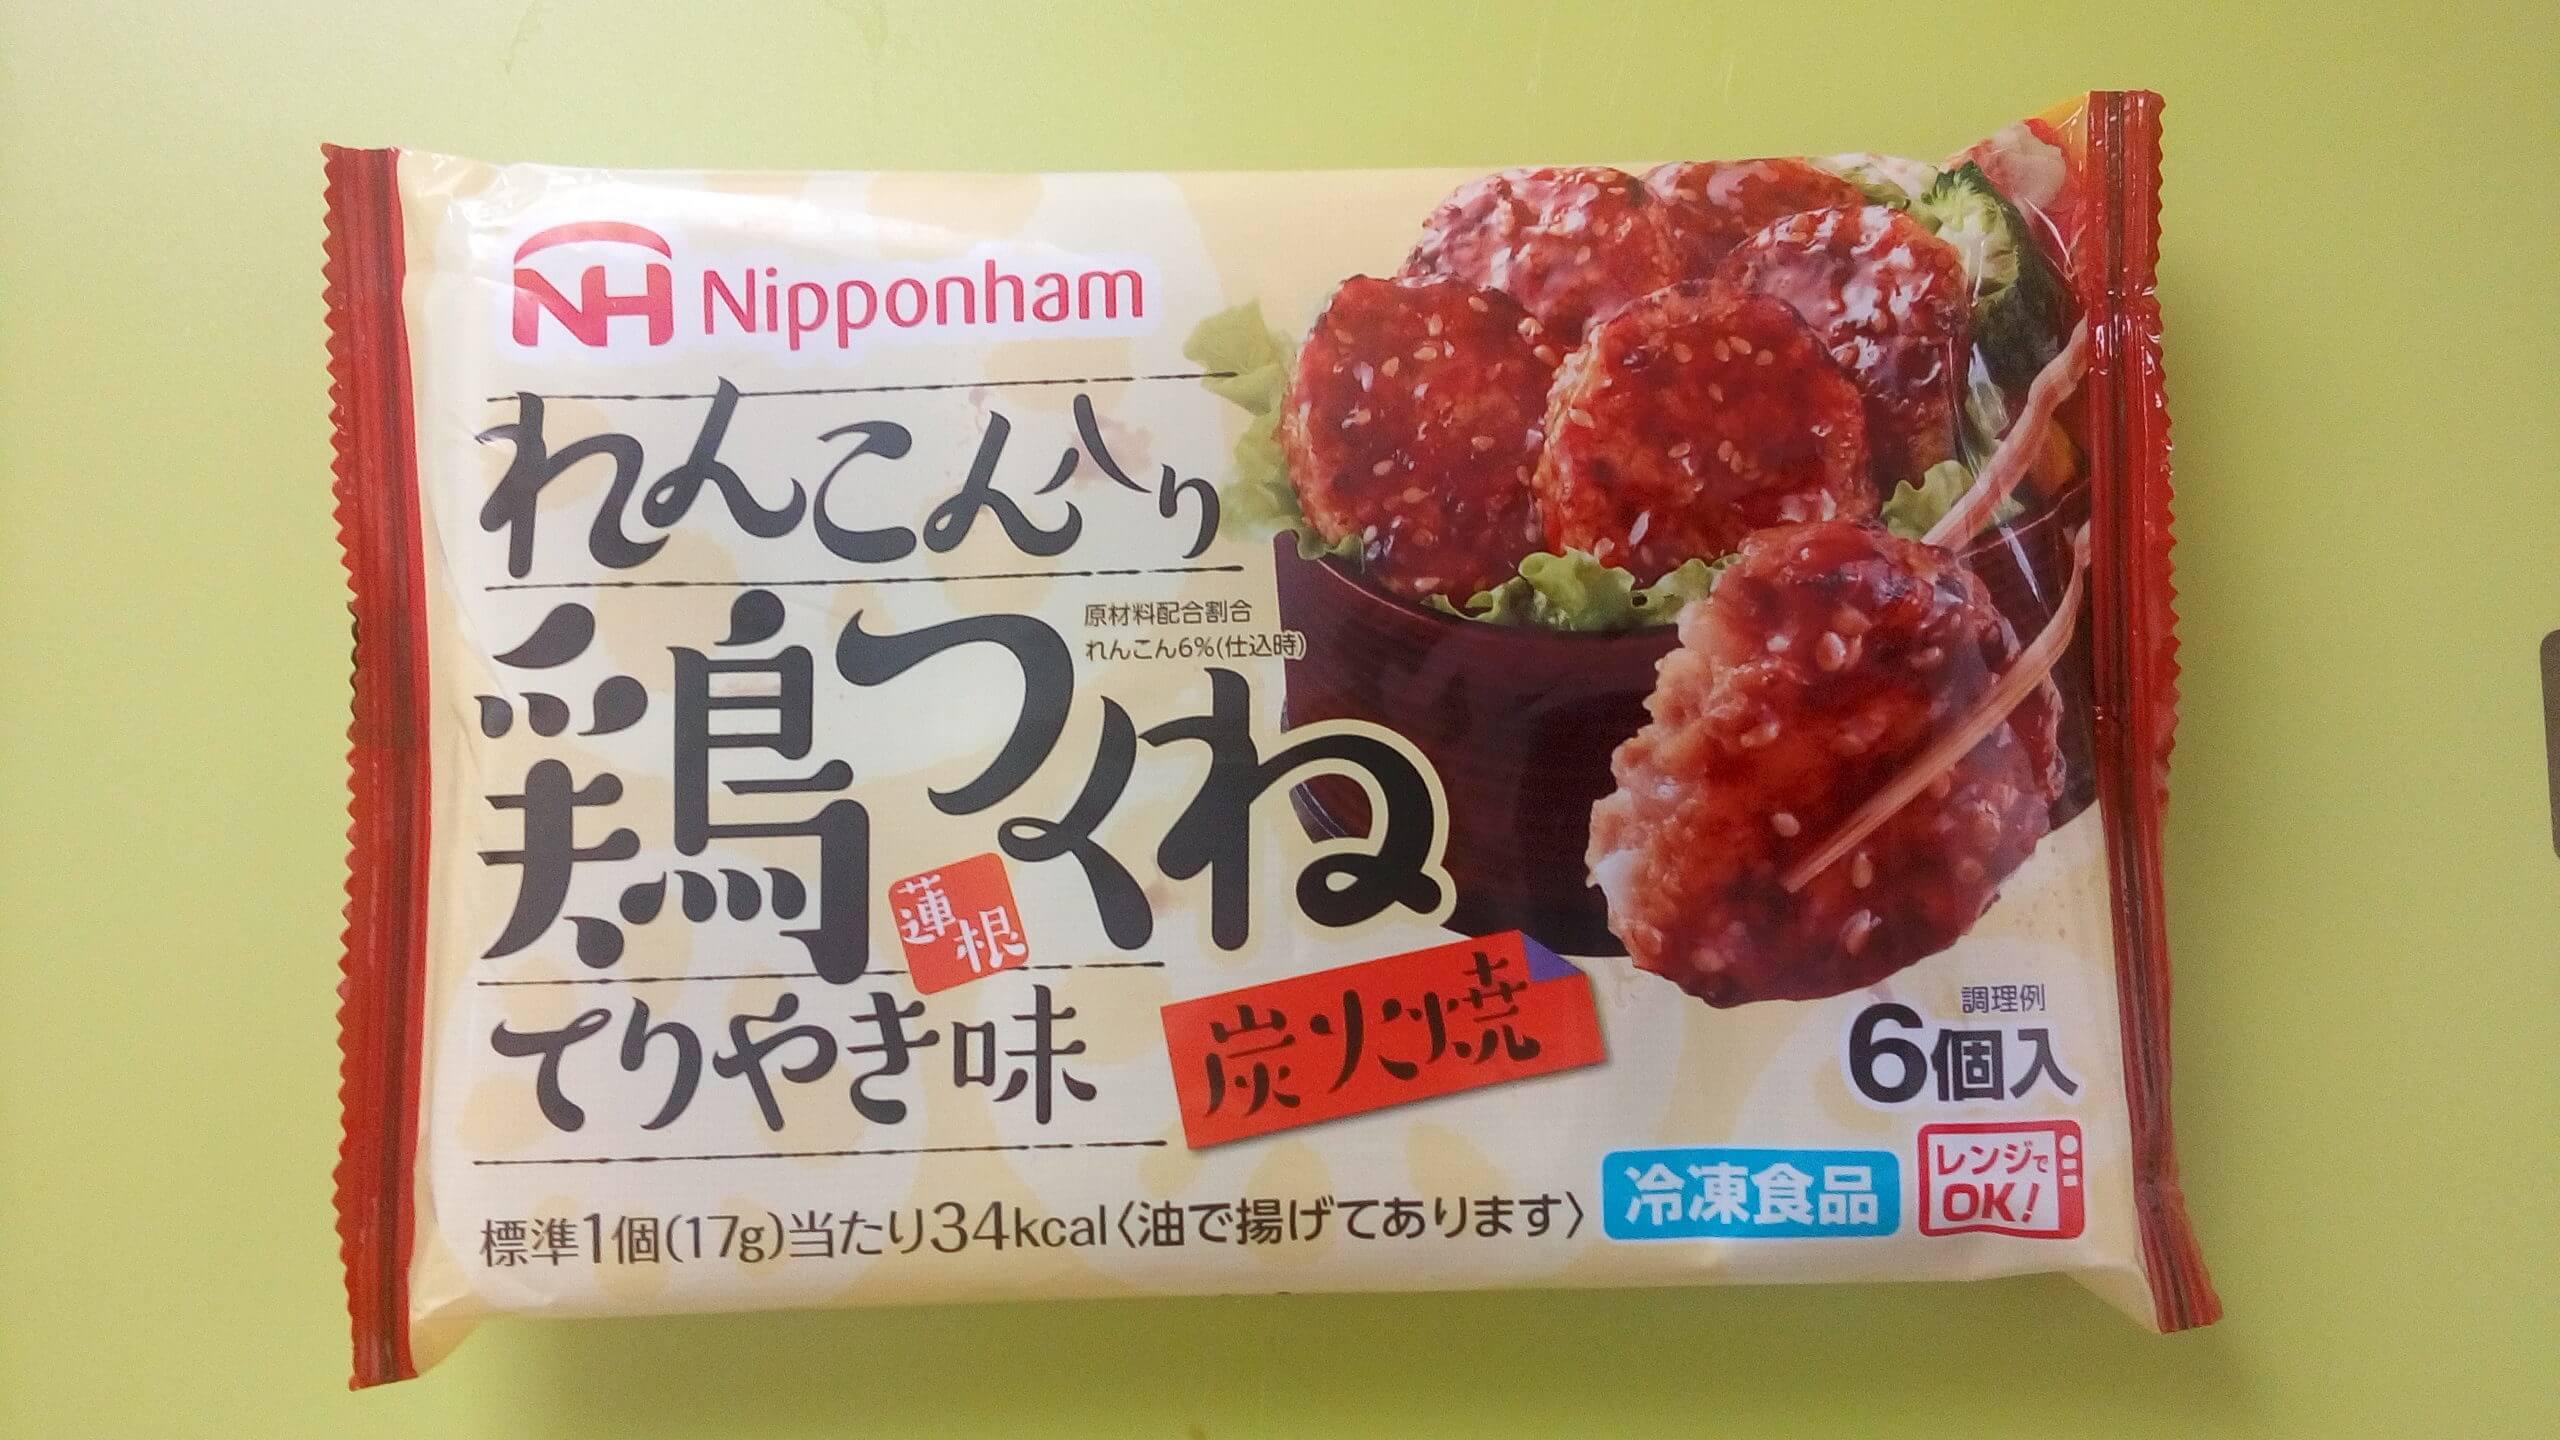 Nipponham れんこん入り鶏つくね てりやき味 炭火焼き